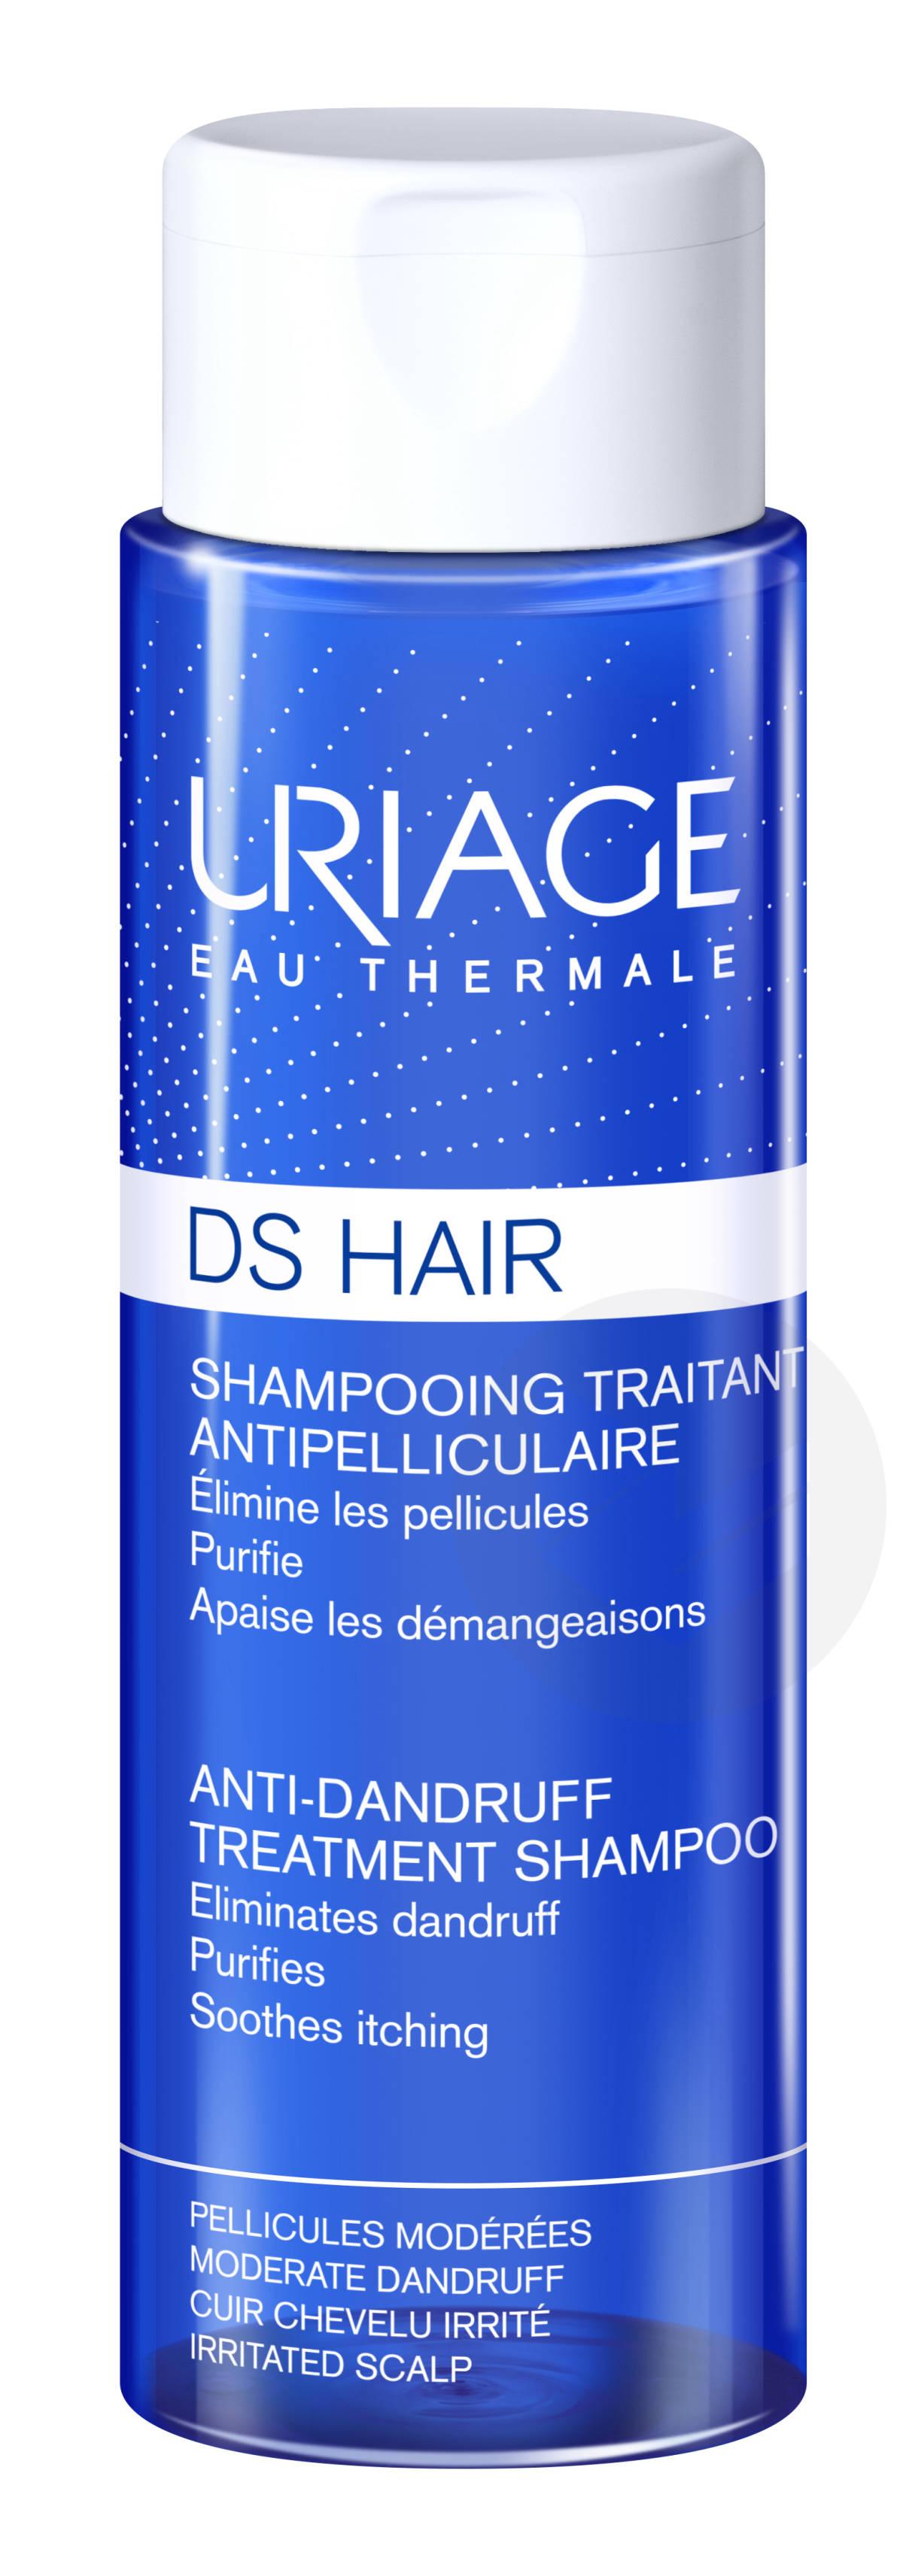 Ds Hair Shampooing Traitant Antipelliculaire 200 Ml